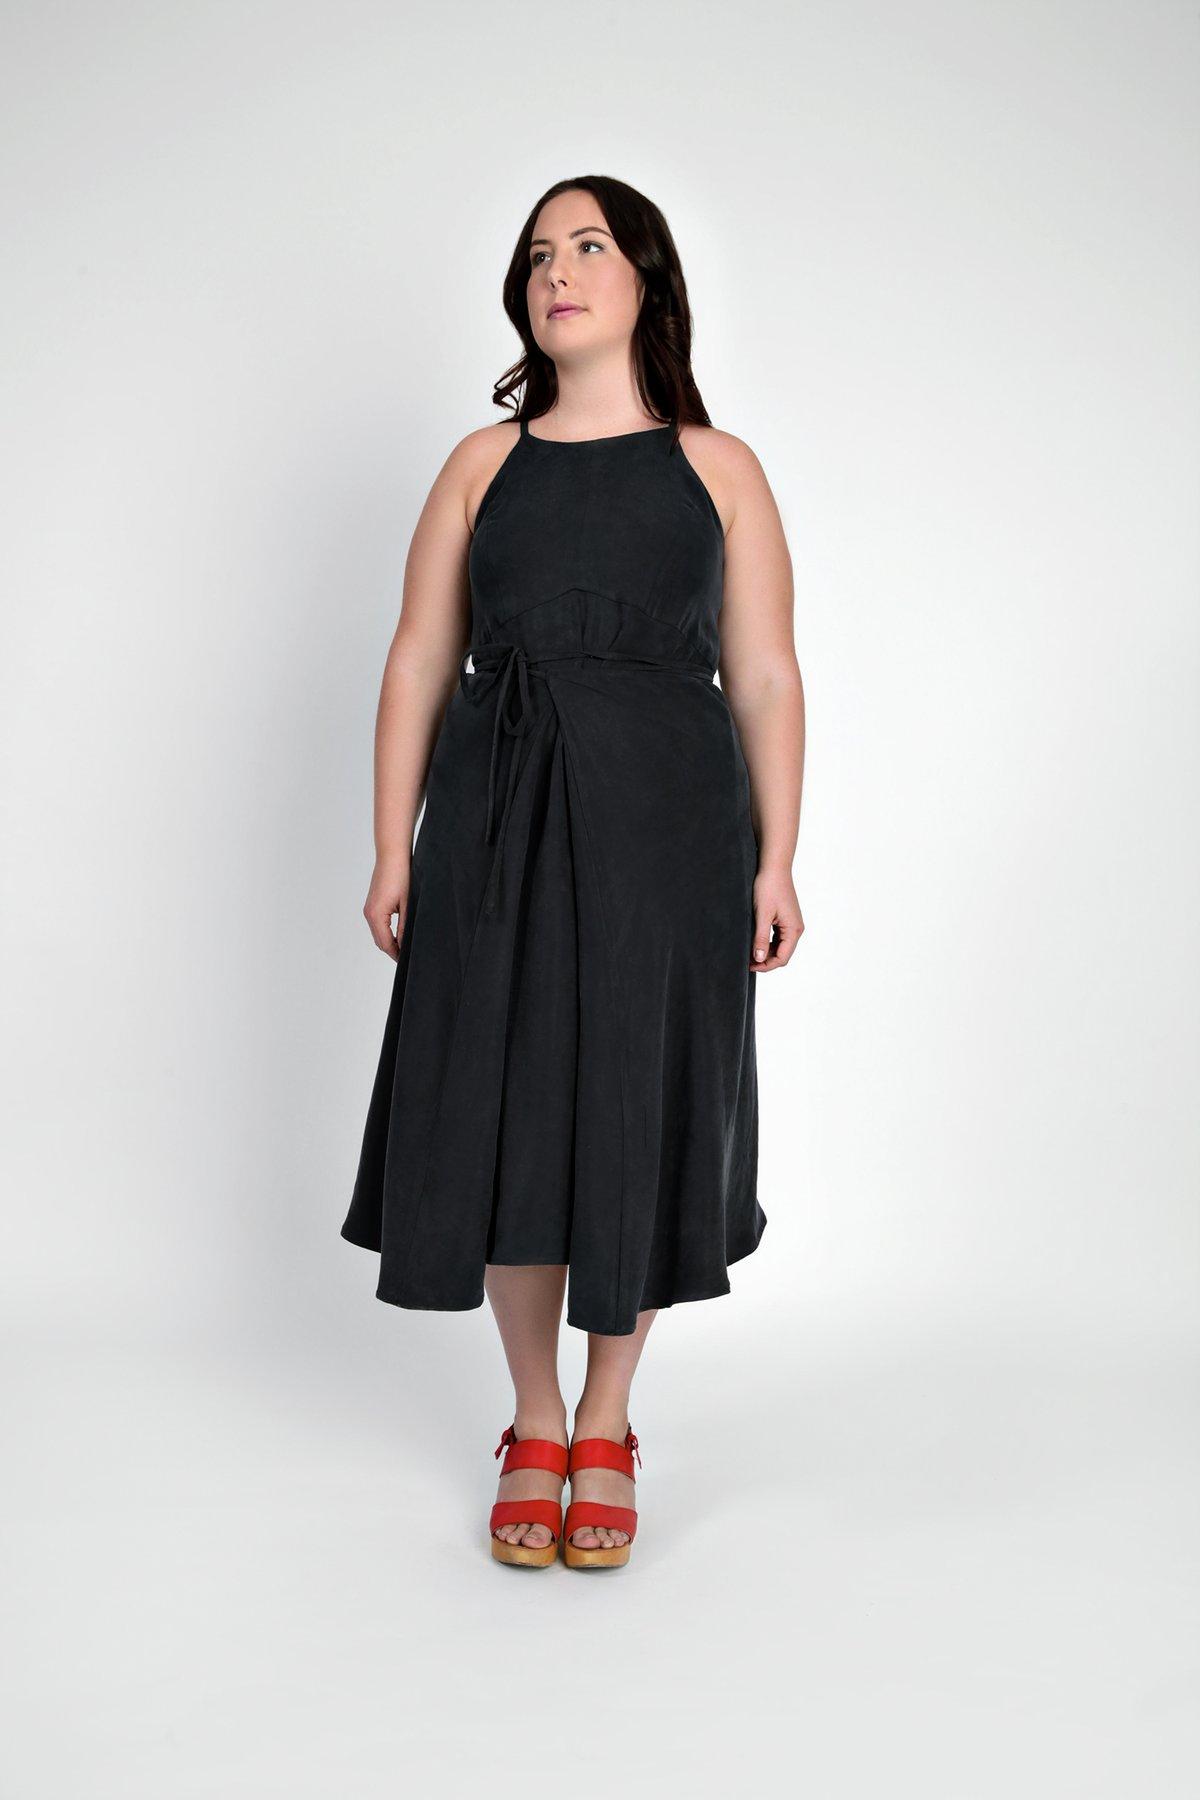 Acton dress sew-along -